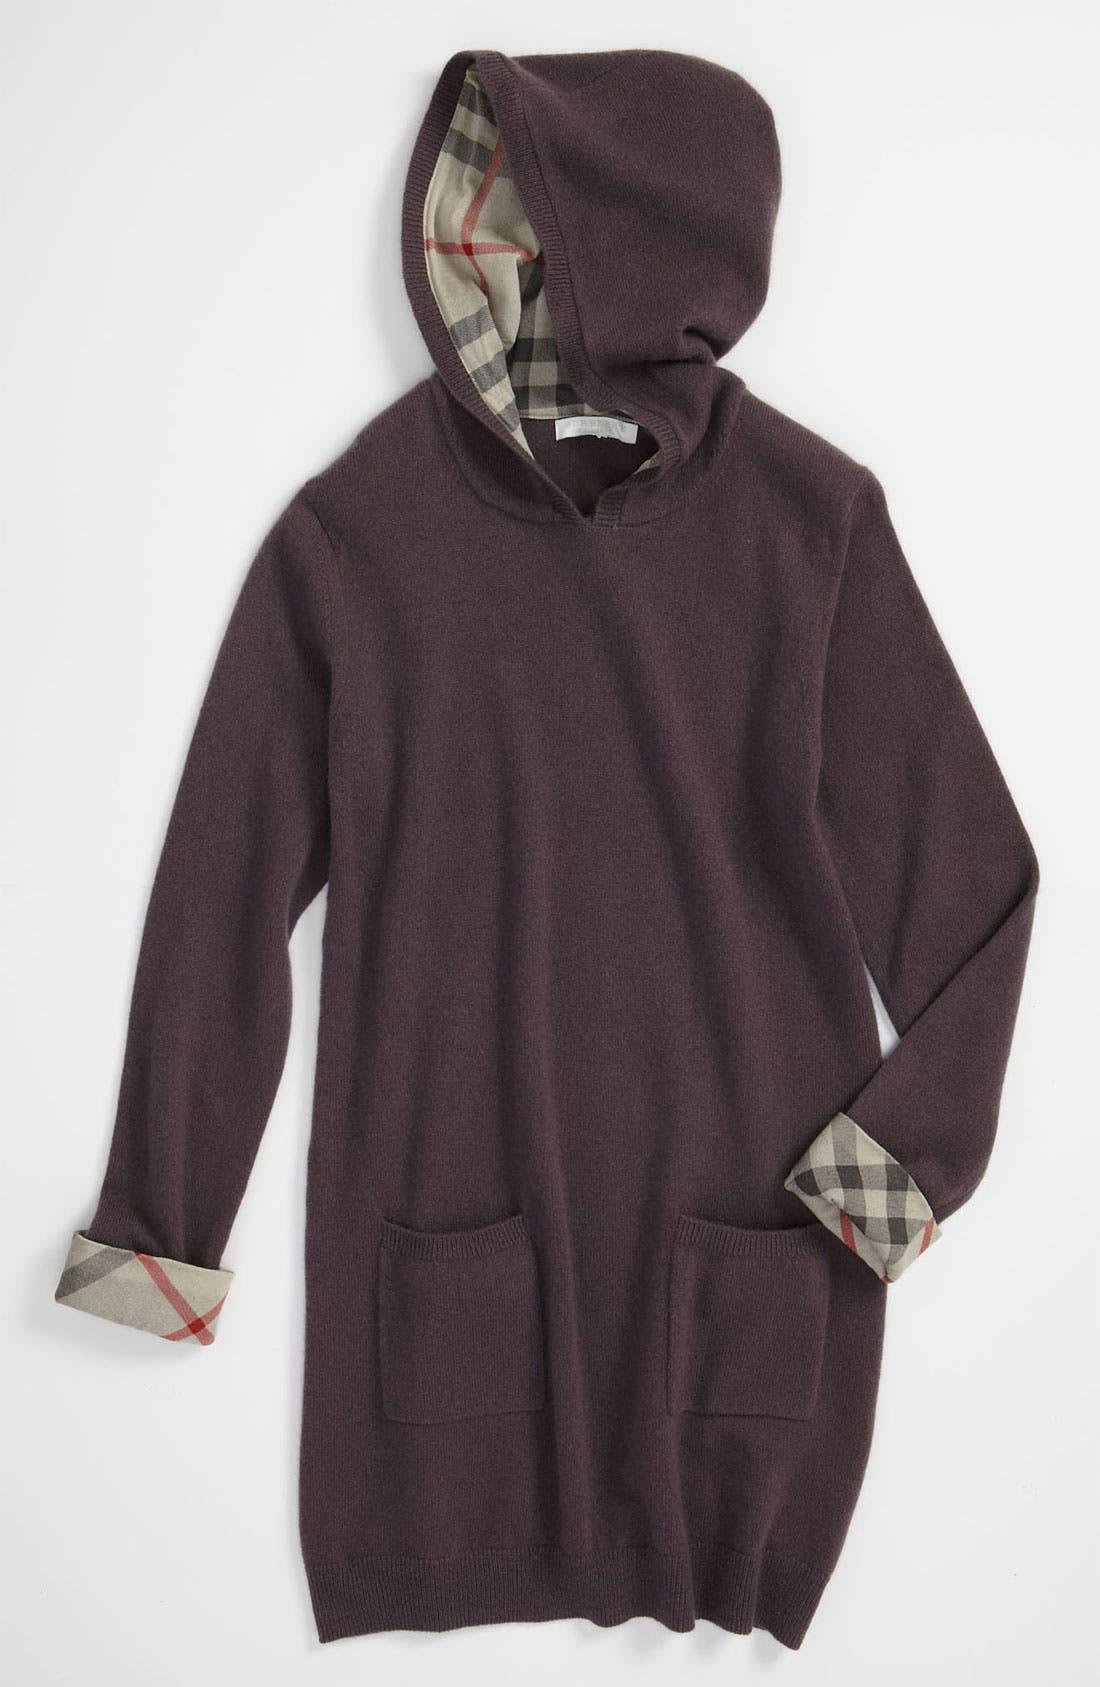 Alternate Image 1 Selected - Burberry Cashmere Tunic Dress (Big Girls)